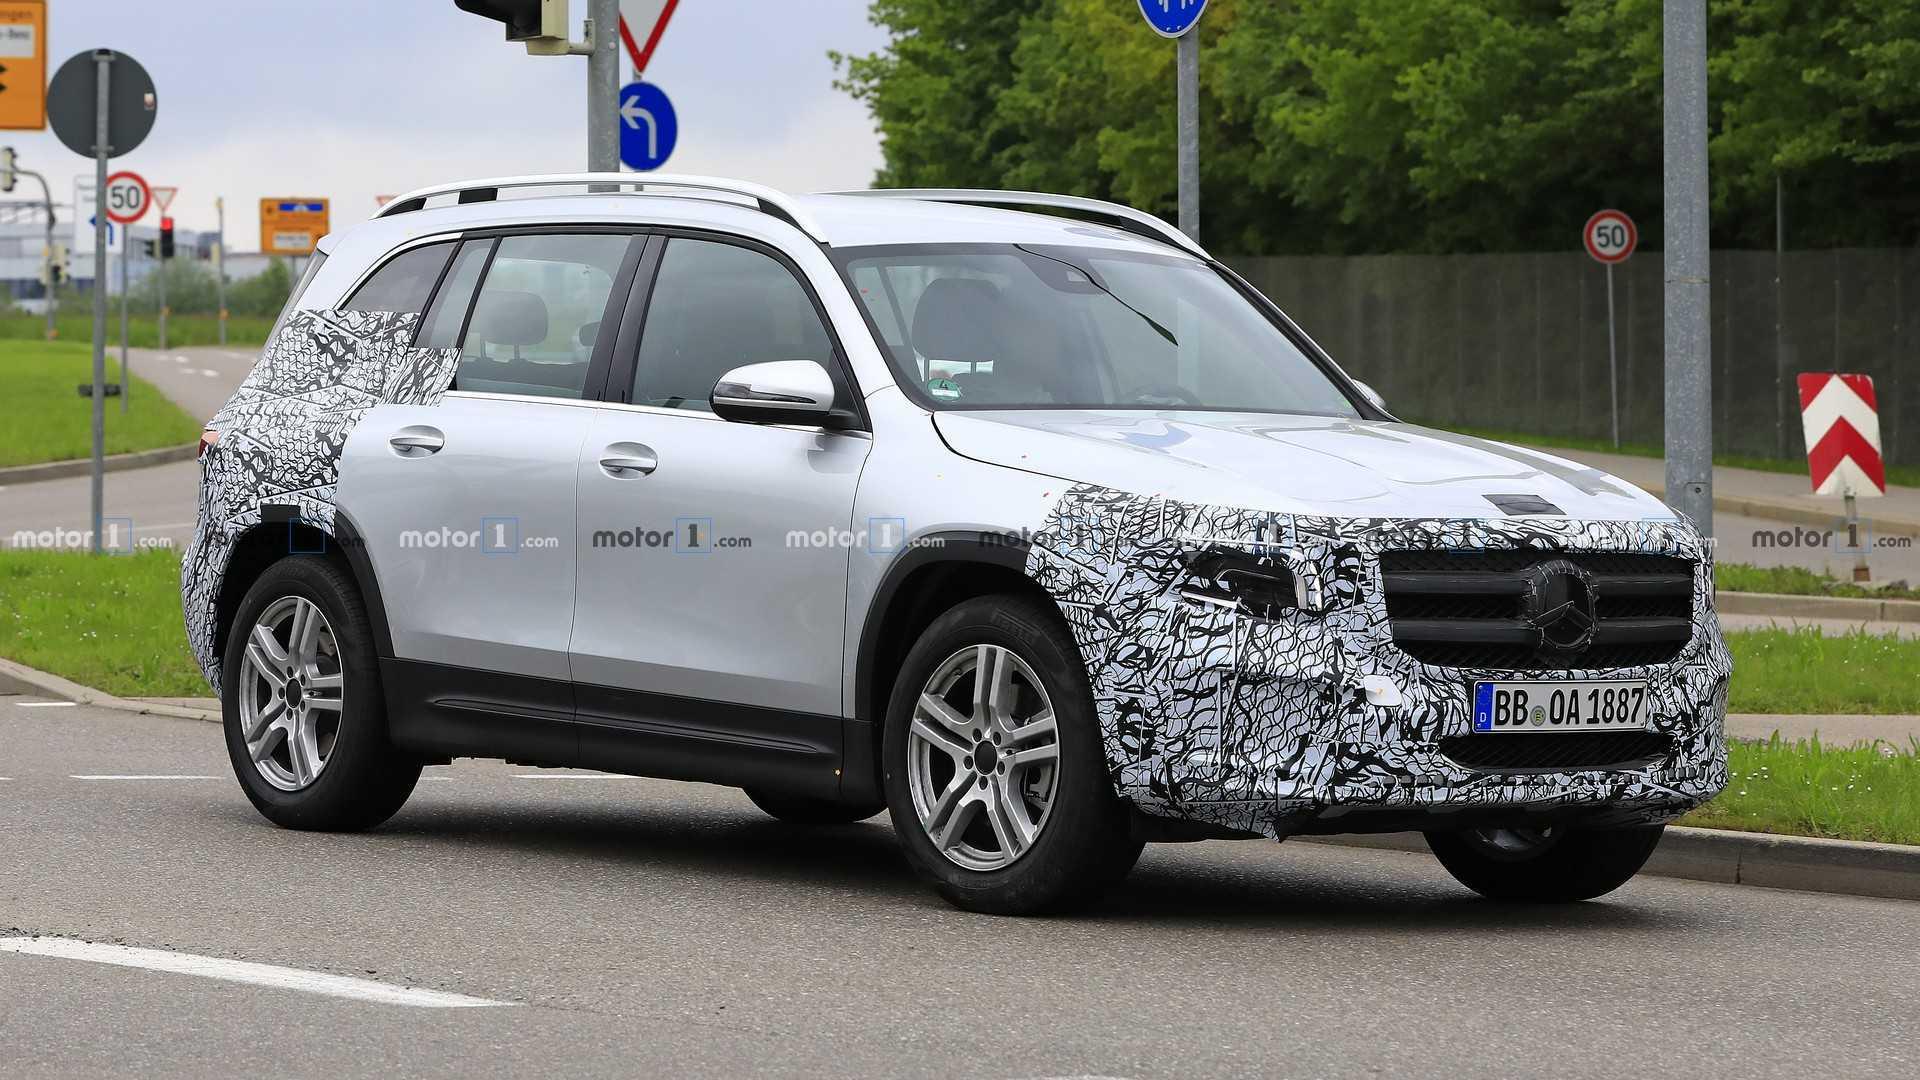 2018 - [Mercedes-Benz] GLB - Page 6 2020-mercedes-glb-spy-photo